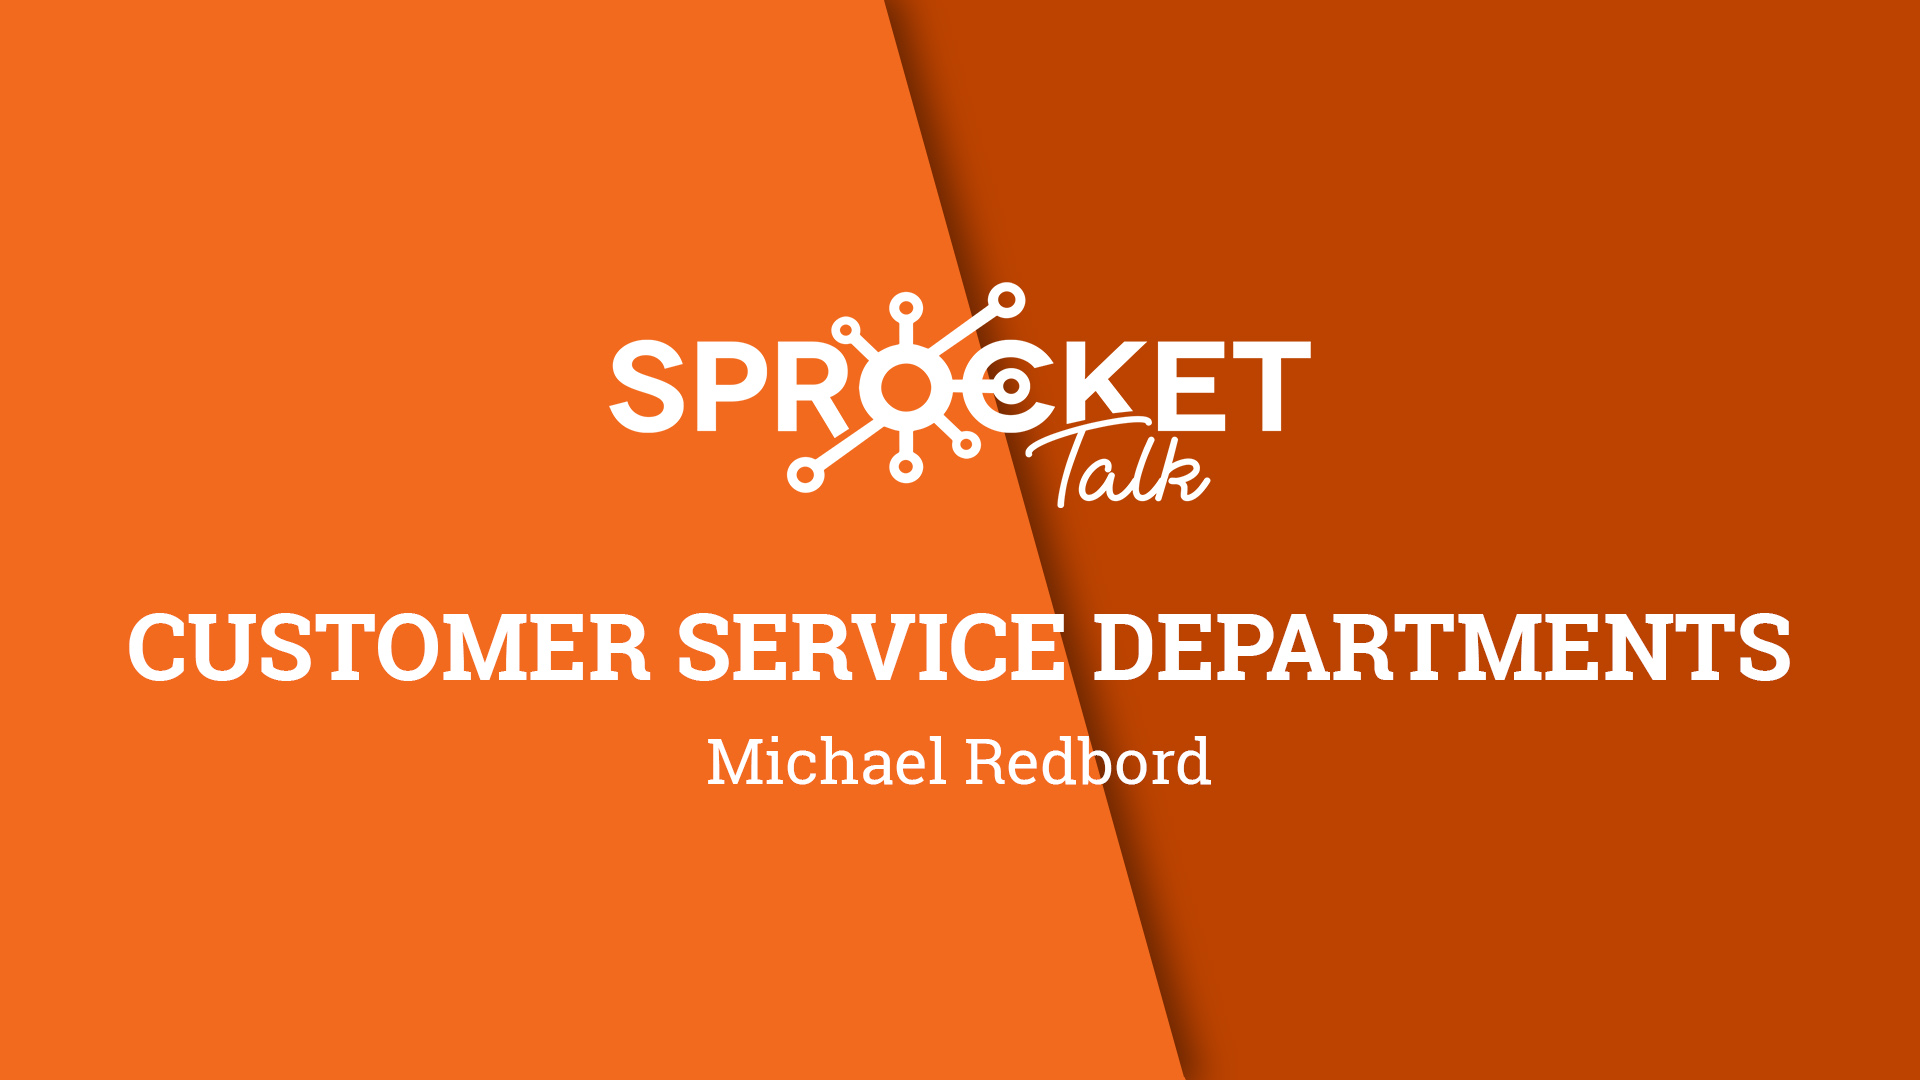 Michael Redboard | Service Departments